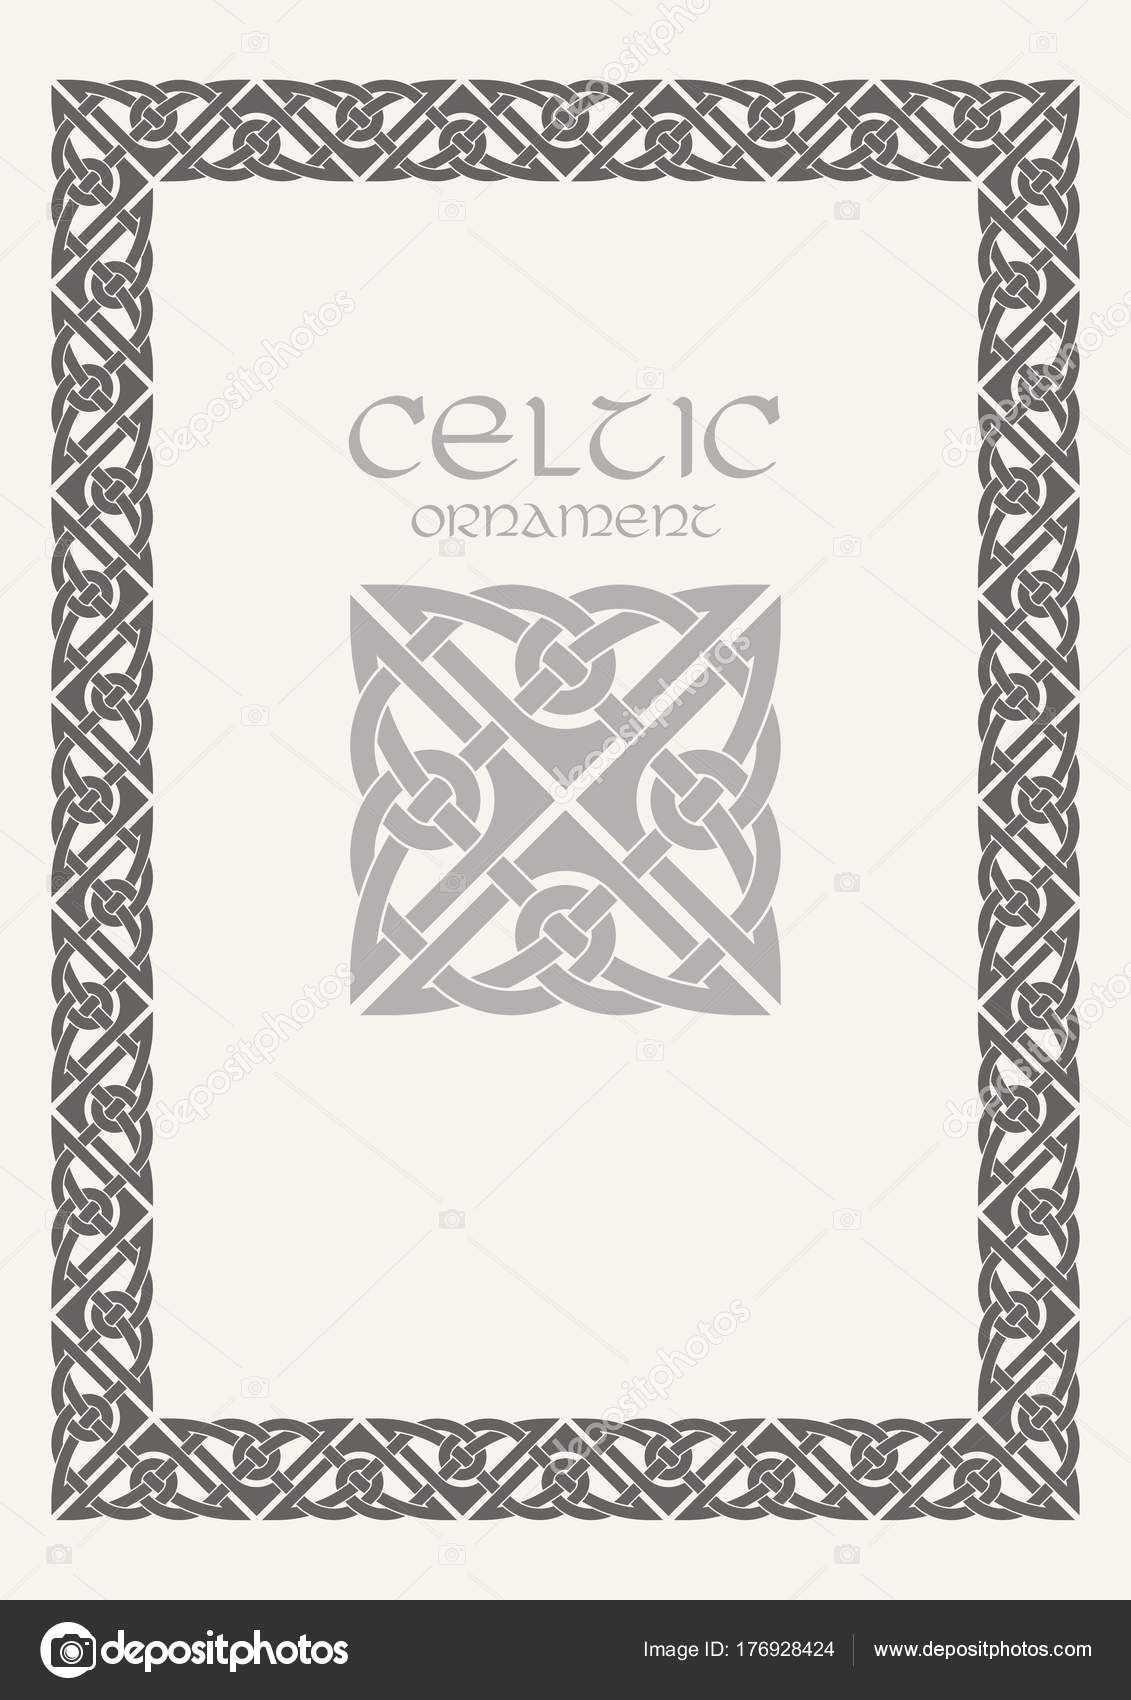 noeud celtique tress ornement de bordure de cadre format. Black Bedroom Furniture Sets. Home Design Ideas